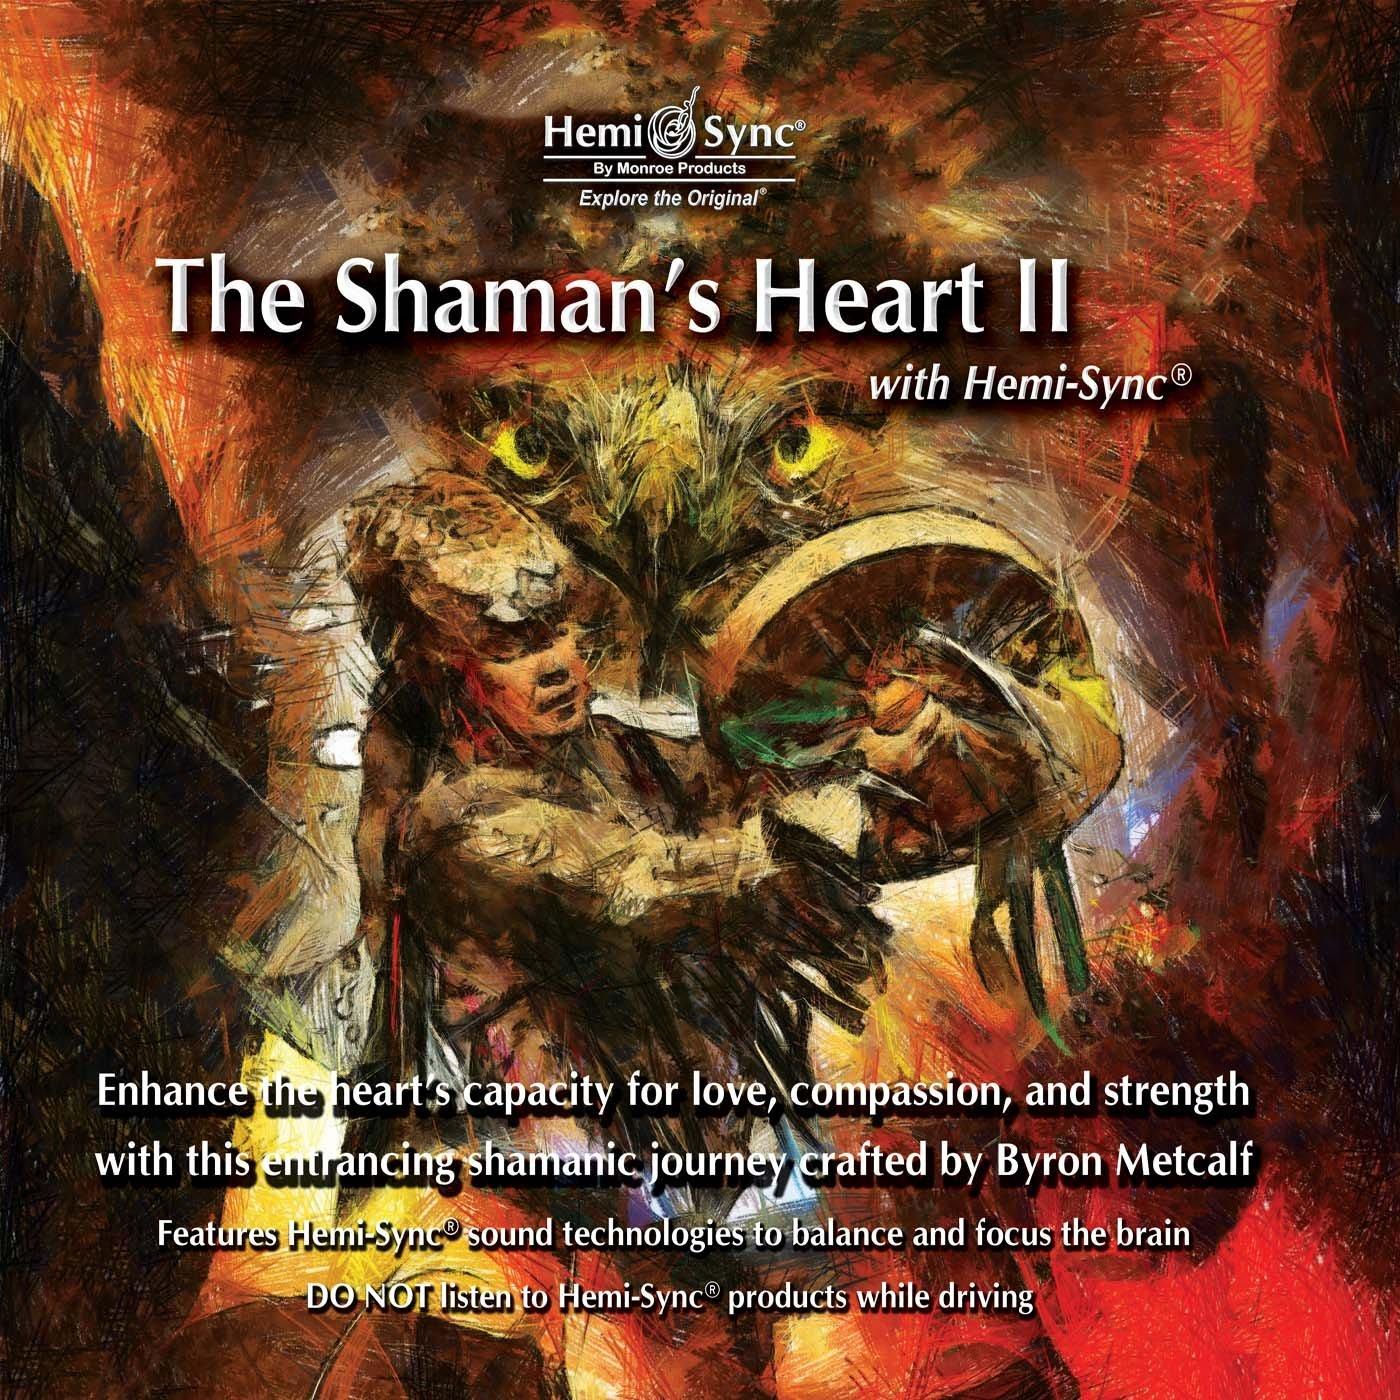 Hemi-Sync The Shaman's Heart II CD